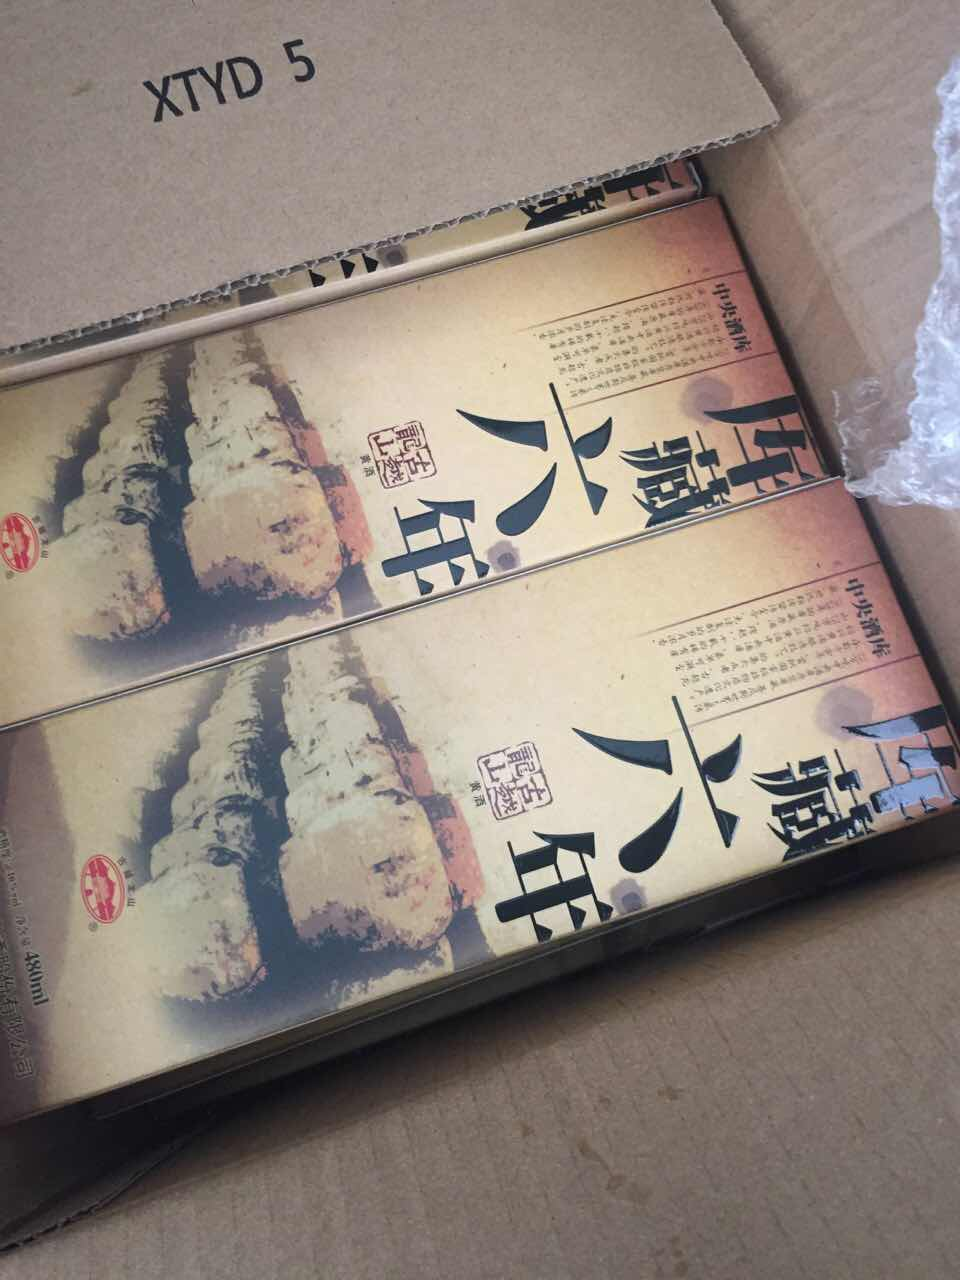 air jordan vi infrared 23 release date 00276386 forsale